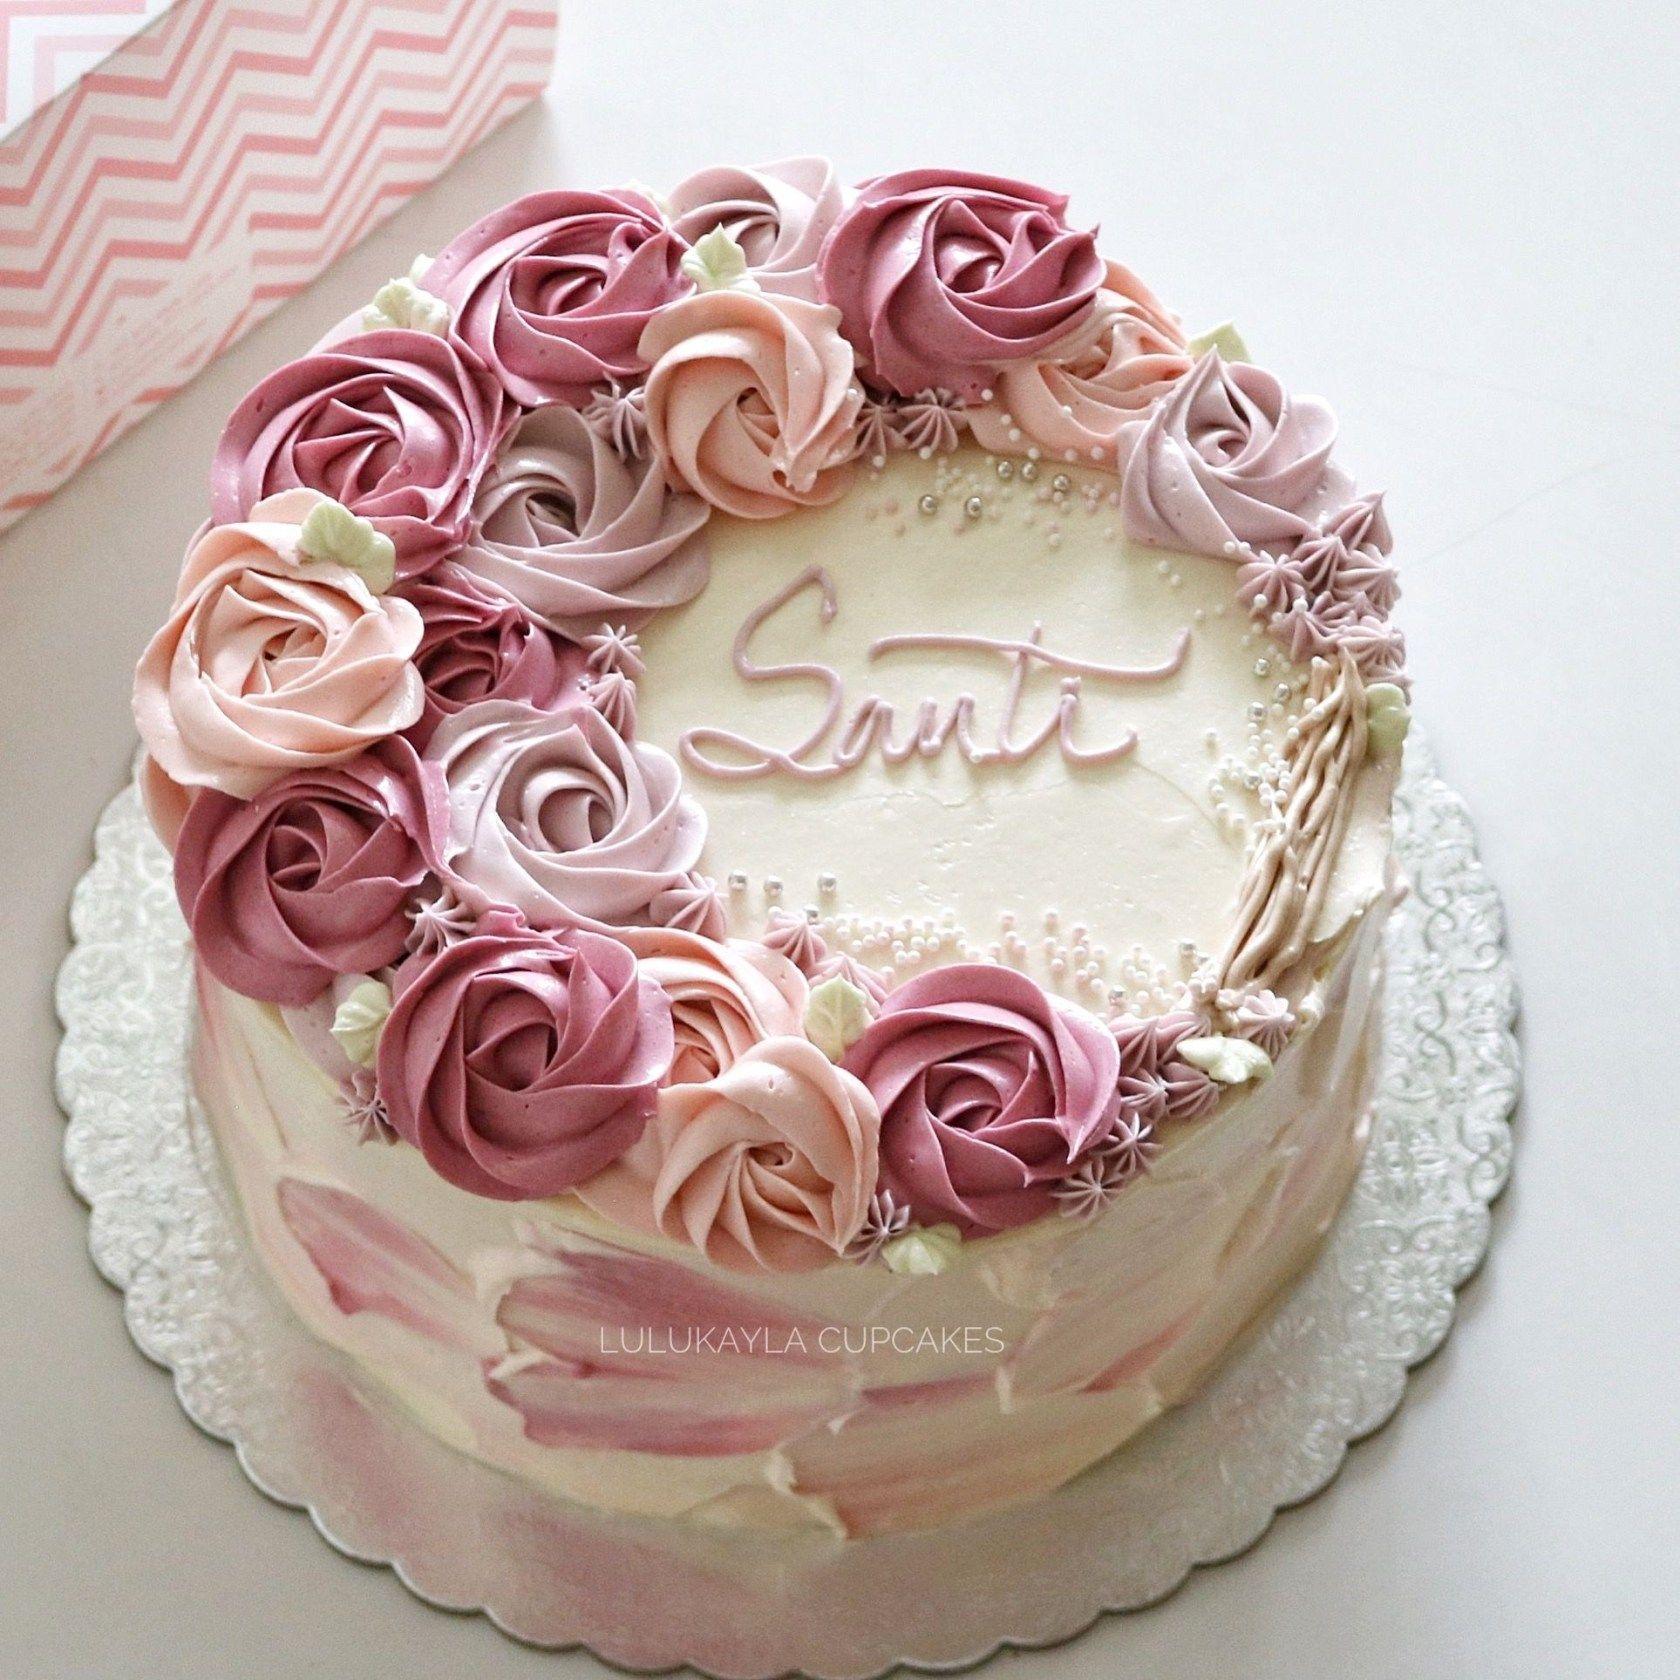 21 Wonderful Photo Of Birthday Cakes With Flowers Davemelillo Com Flower Cake Decorations Birthday Cake With Flowers Cake Decorating Flowers